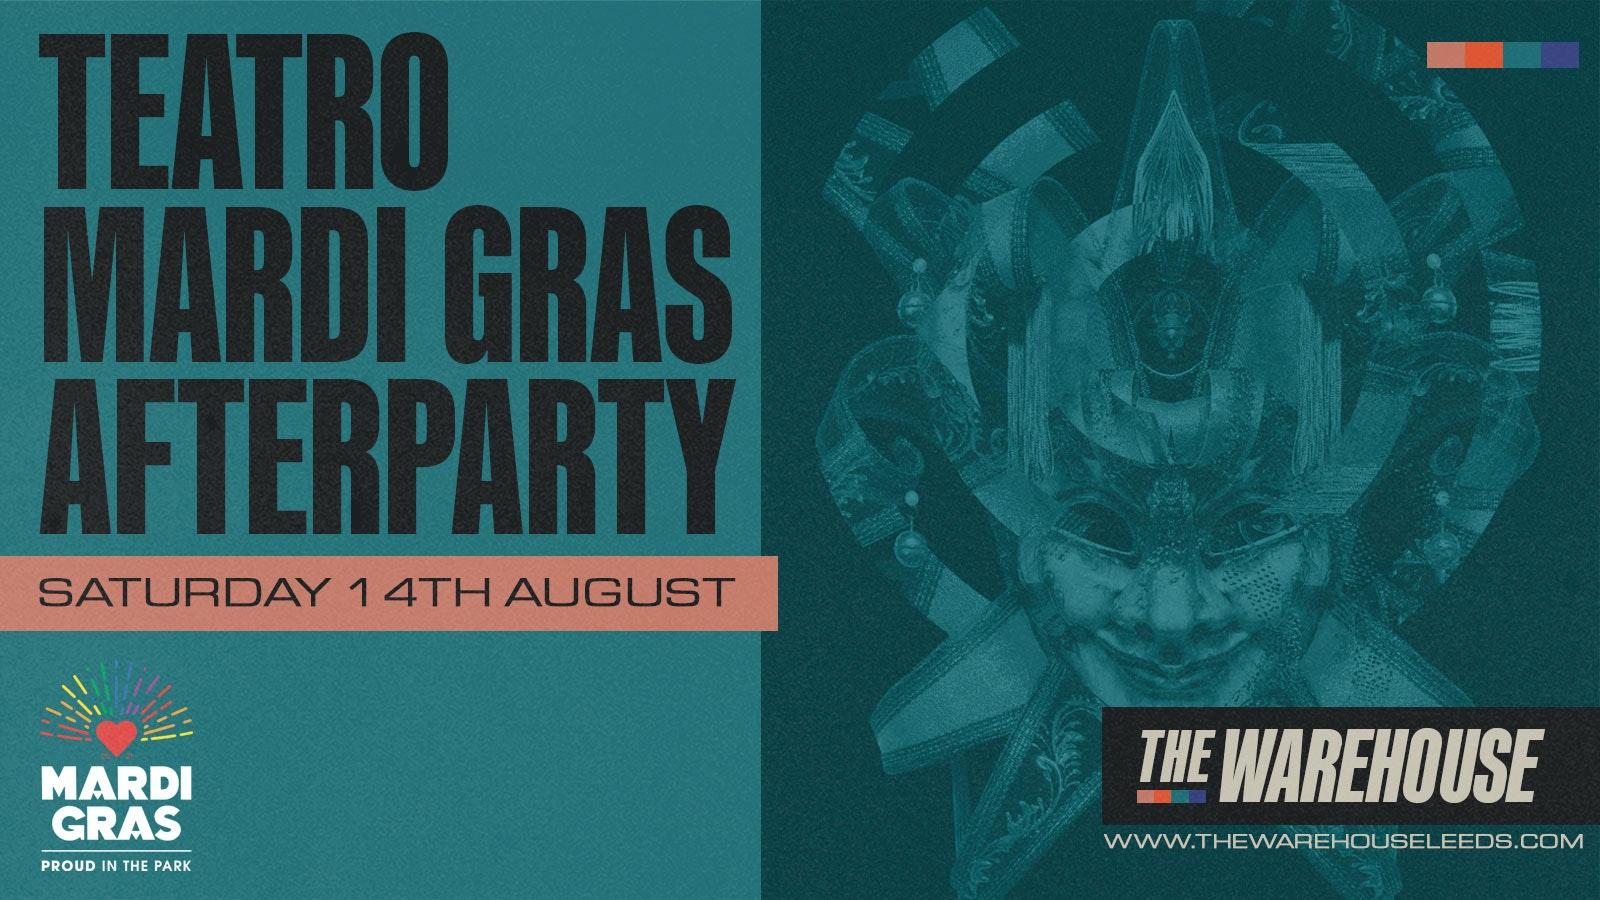 Teatro presents Mardi Gras Festival Afterparty – Club